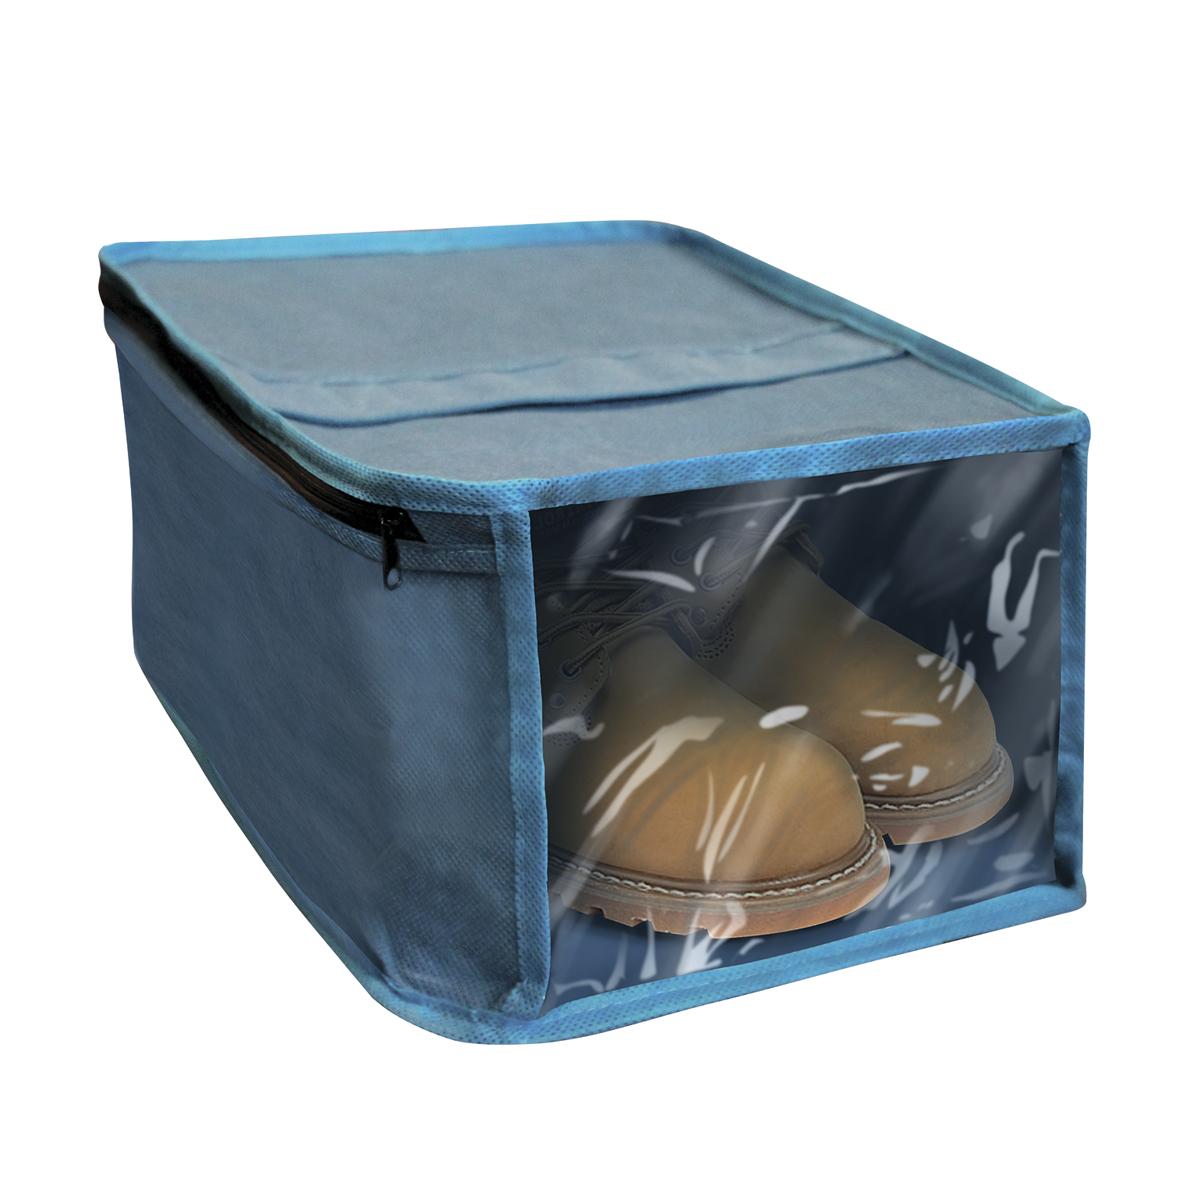 Чехол для хранения обуви Miolla, с окошком, цвет: синий, 30 х 25 х 15 см